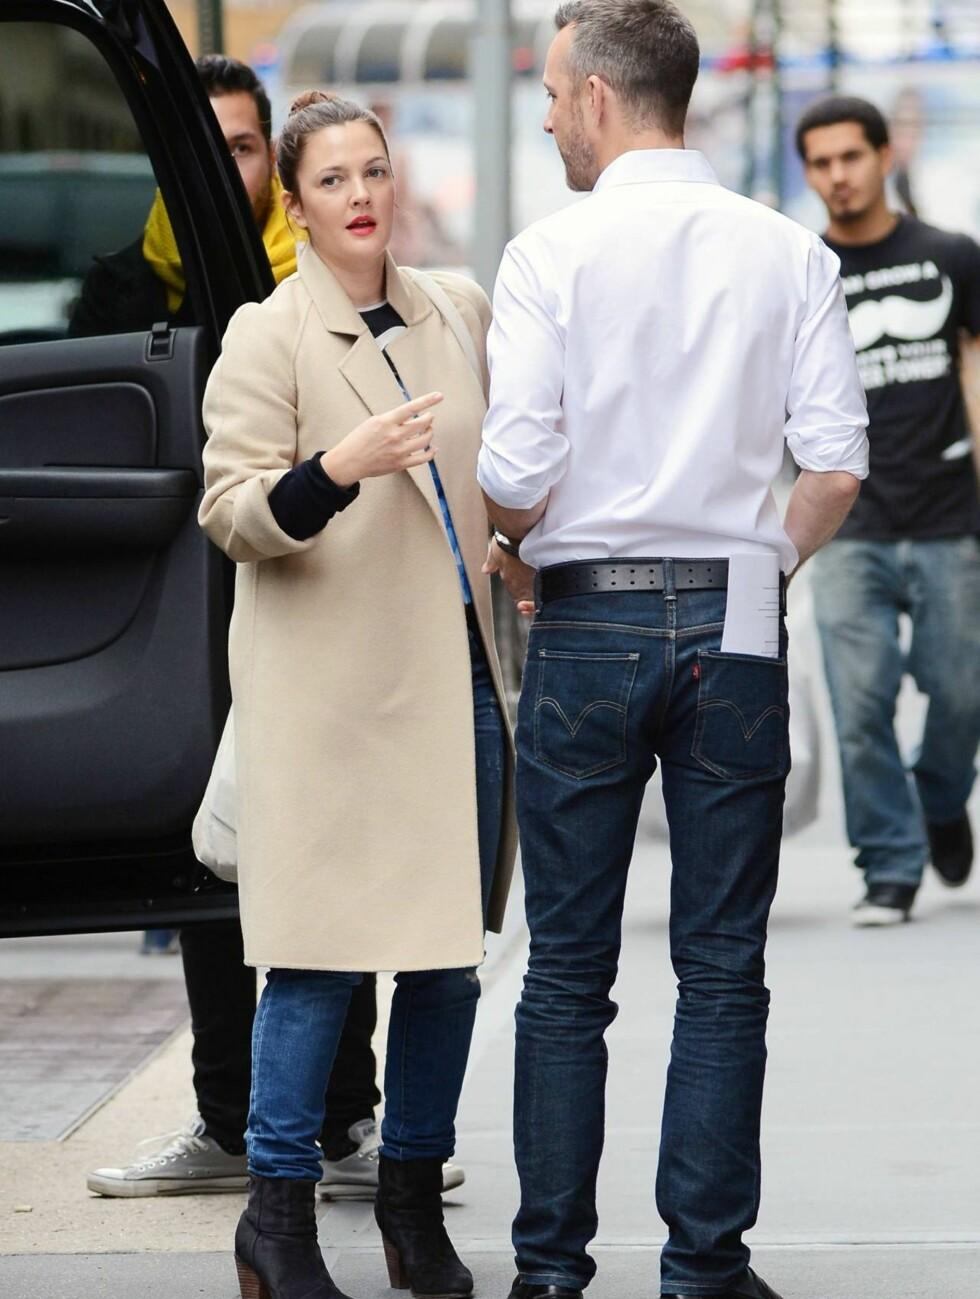 FRESH: Drew Barrymore i New York tidligere i måneden. Foto: All Over Press